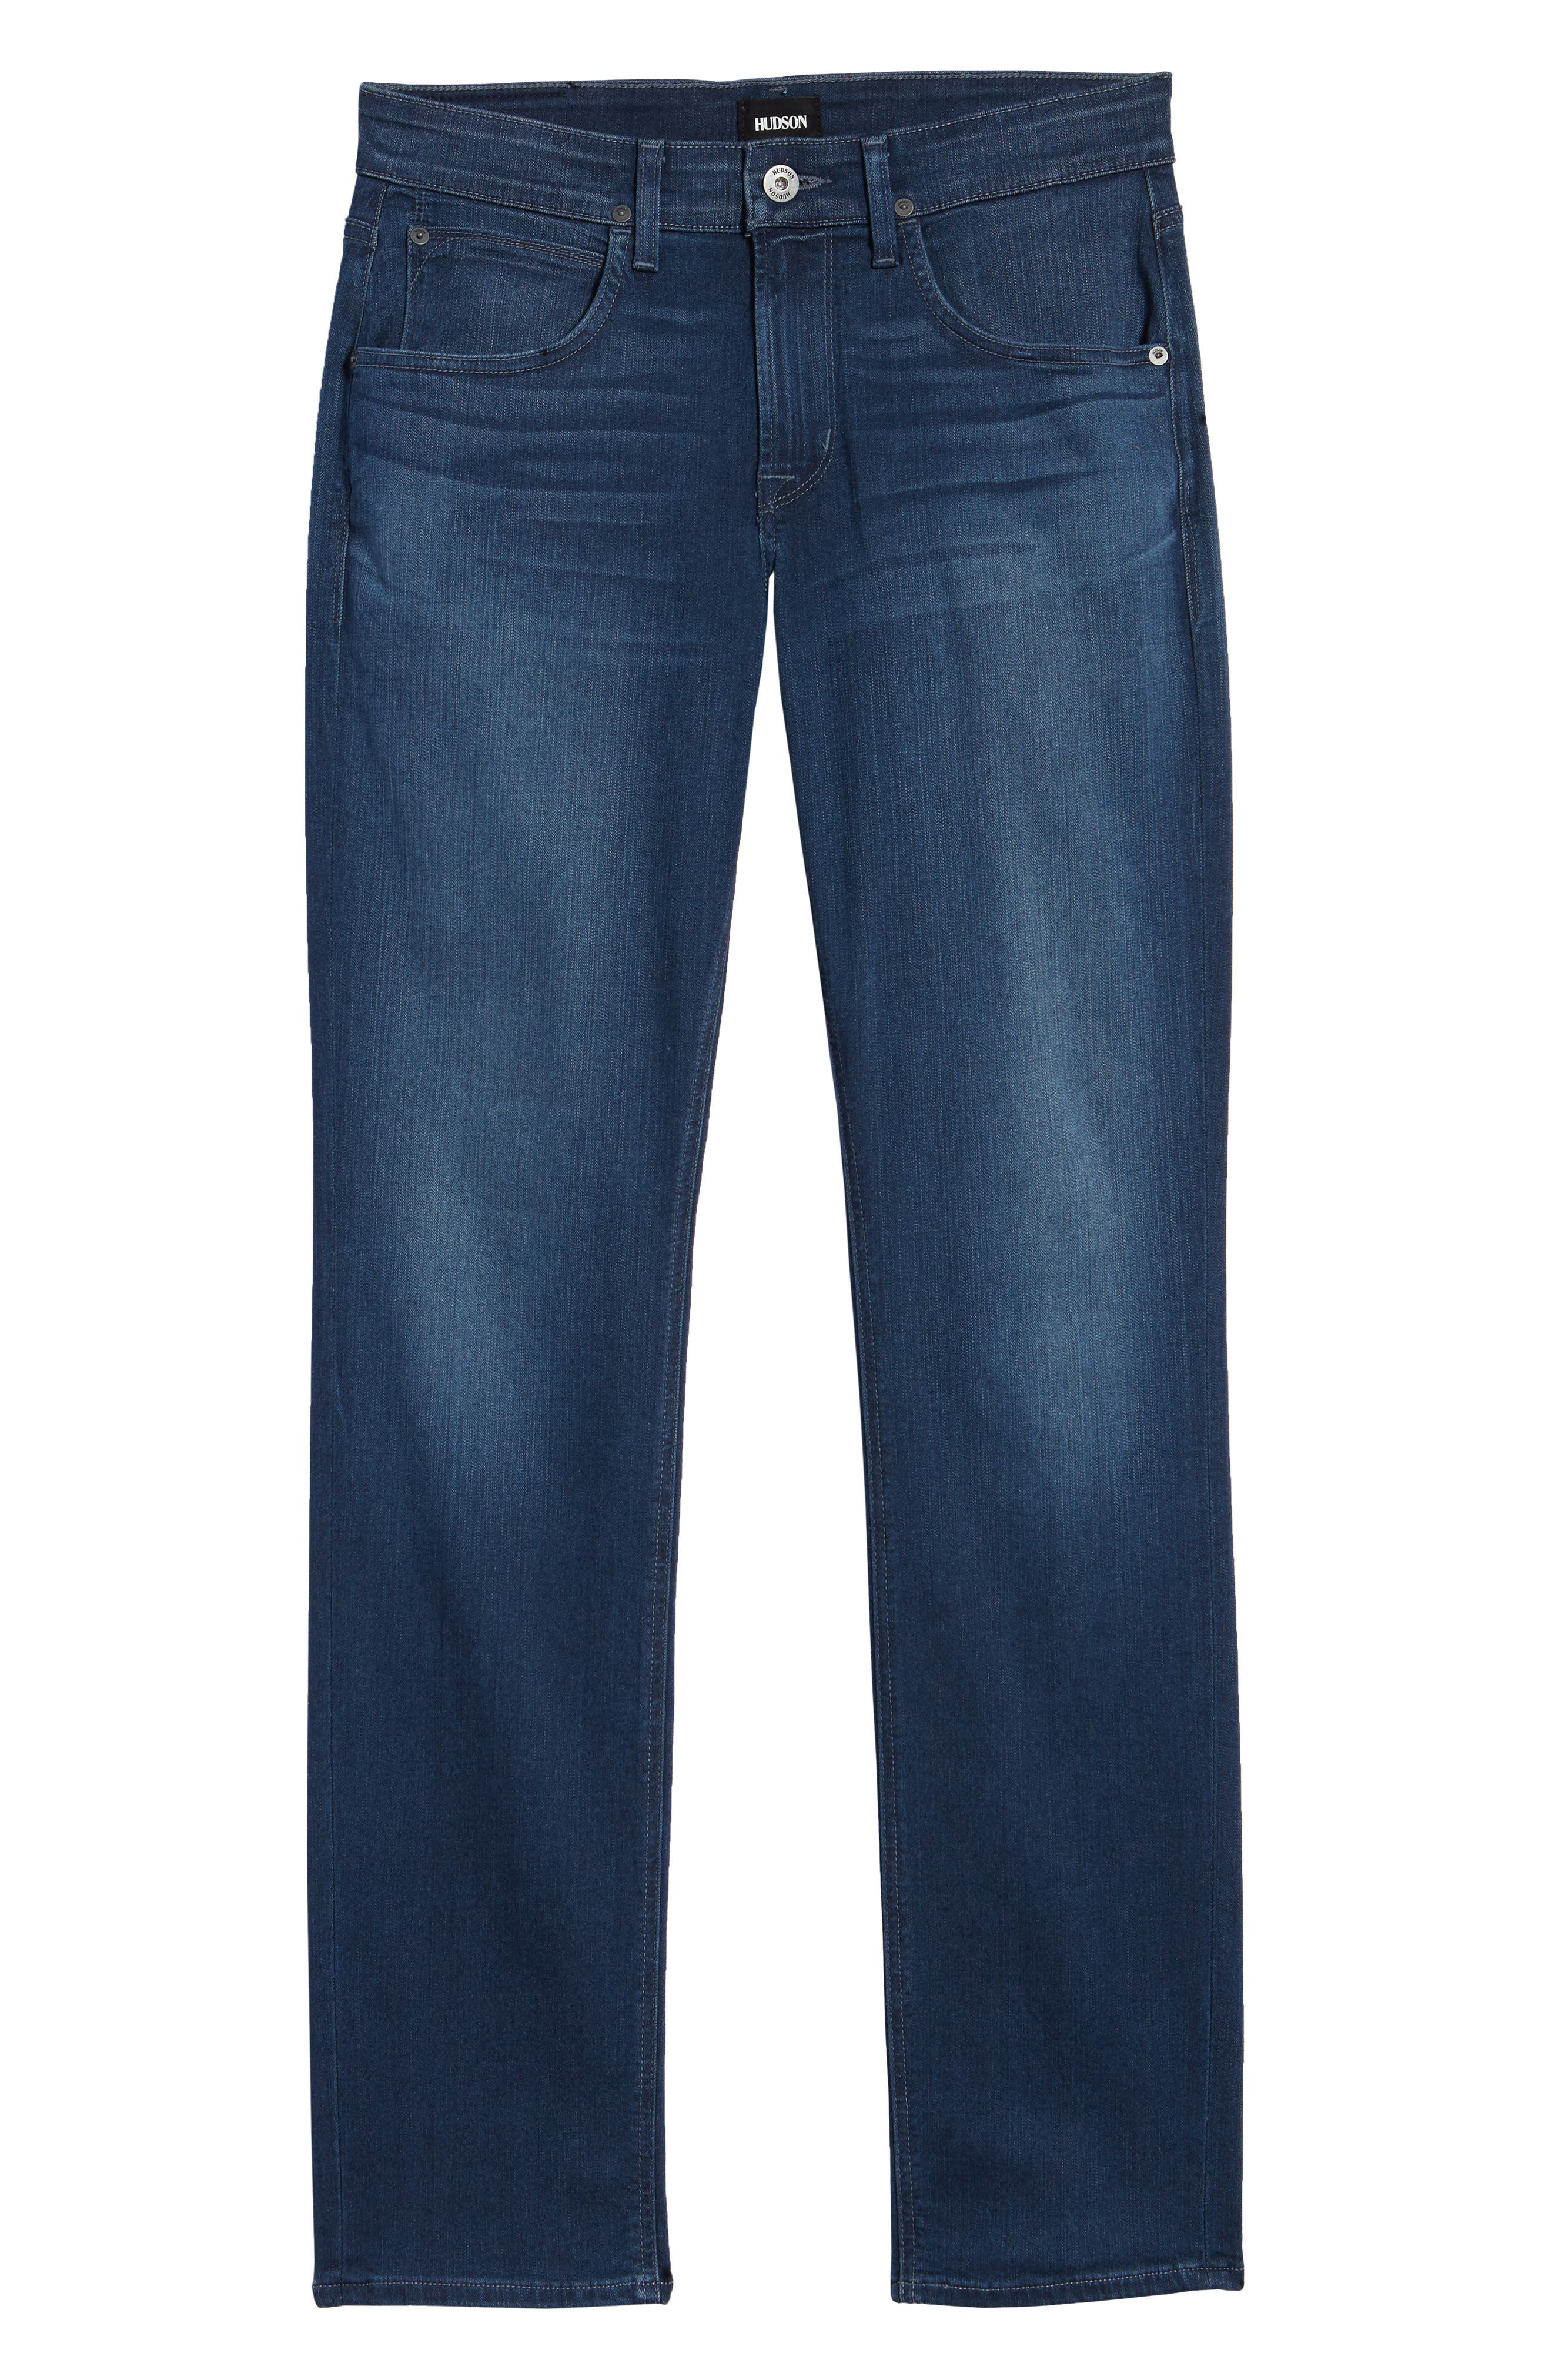 Byron Slim Straight Leg Jeans,                             Alternate thumbnail 6, color,                             403